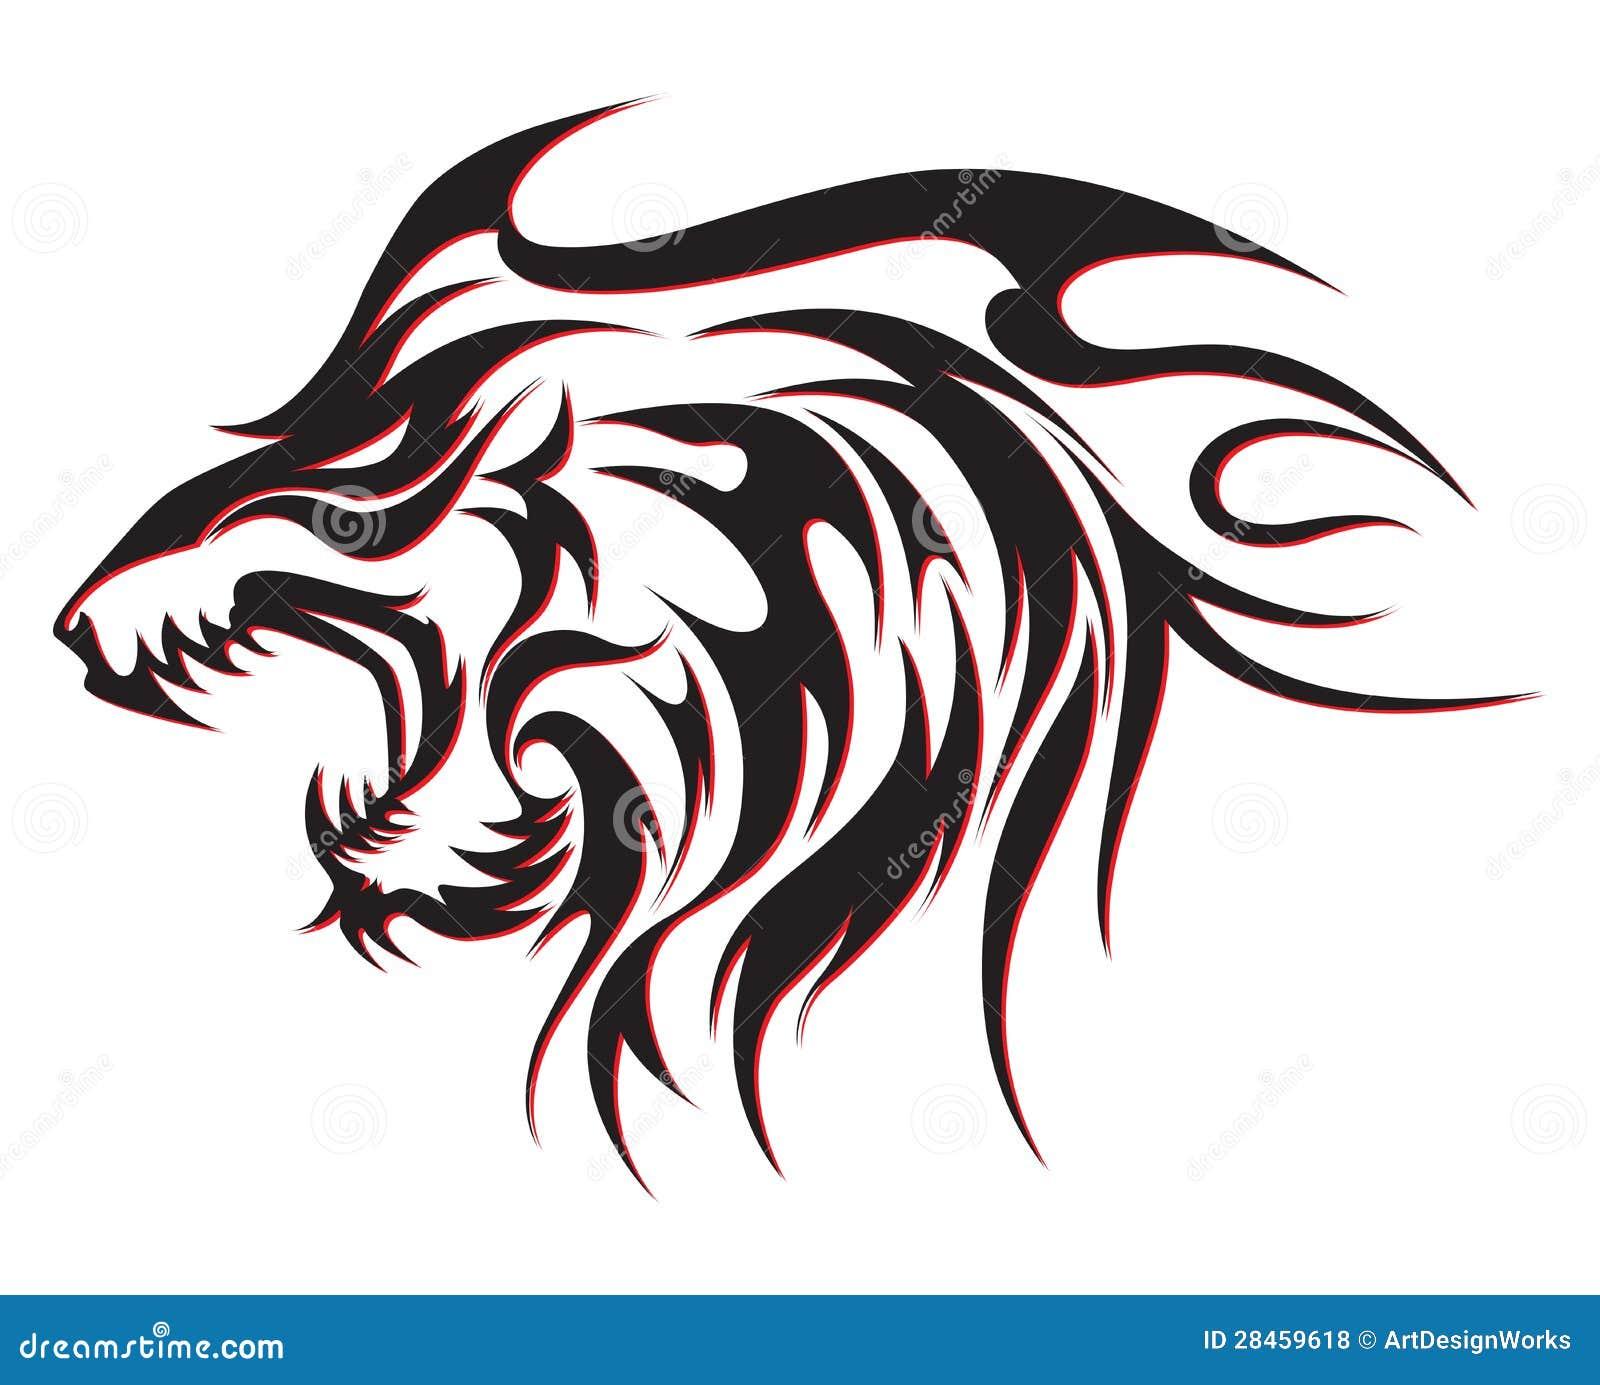 Tribalwolf tatuaż